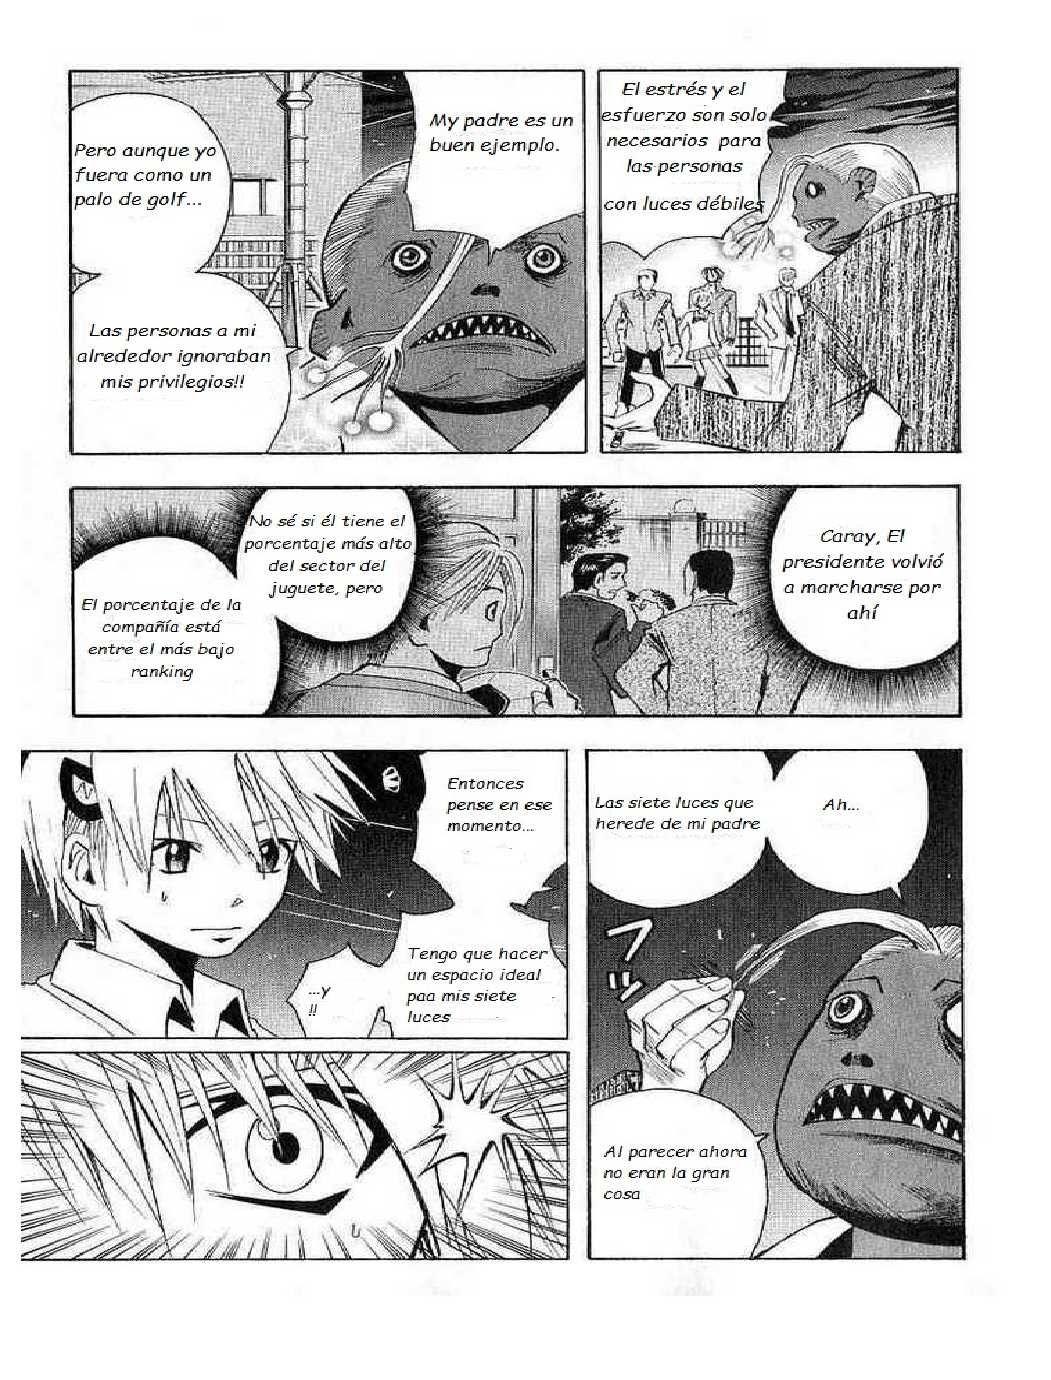 http://c5.ninemanga.com/es_manga/10/20170/485507/d3d0b83accadaea98c2067b460b00c5d.jpg Page 5